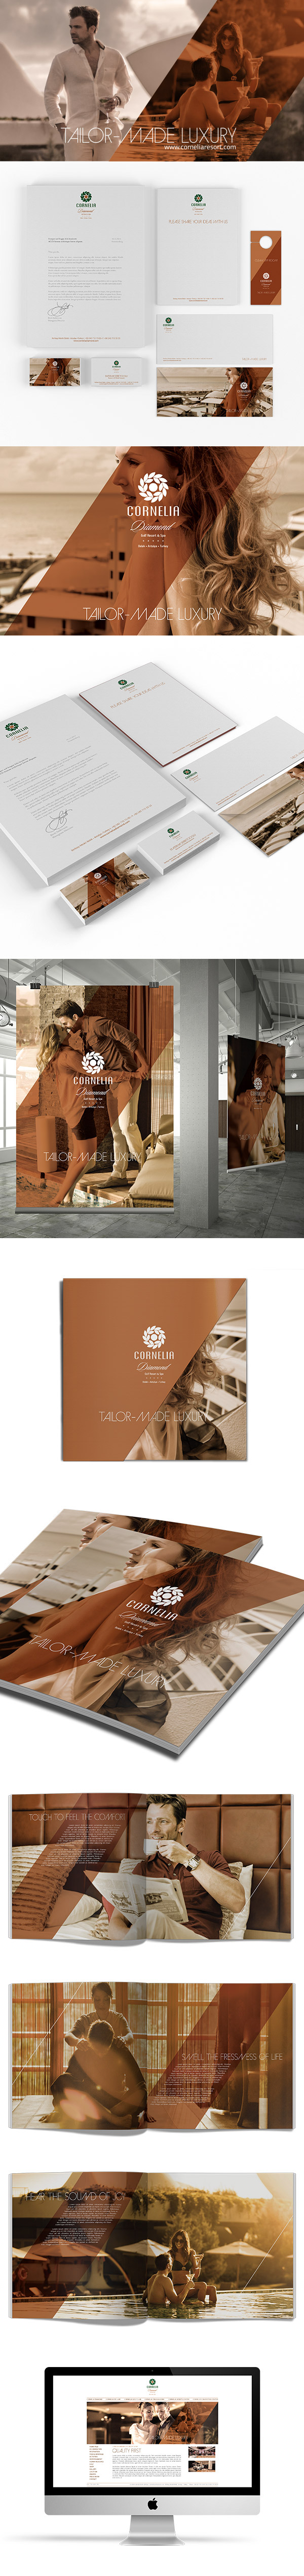 Cornelia Hotels,hotel,diamond